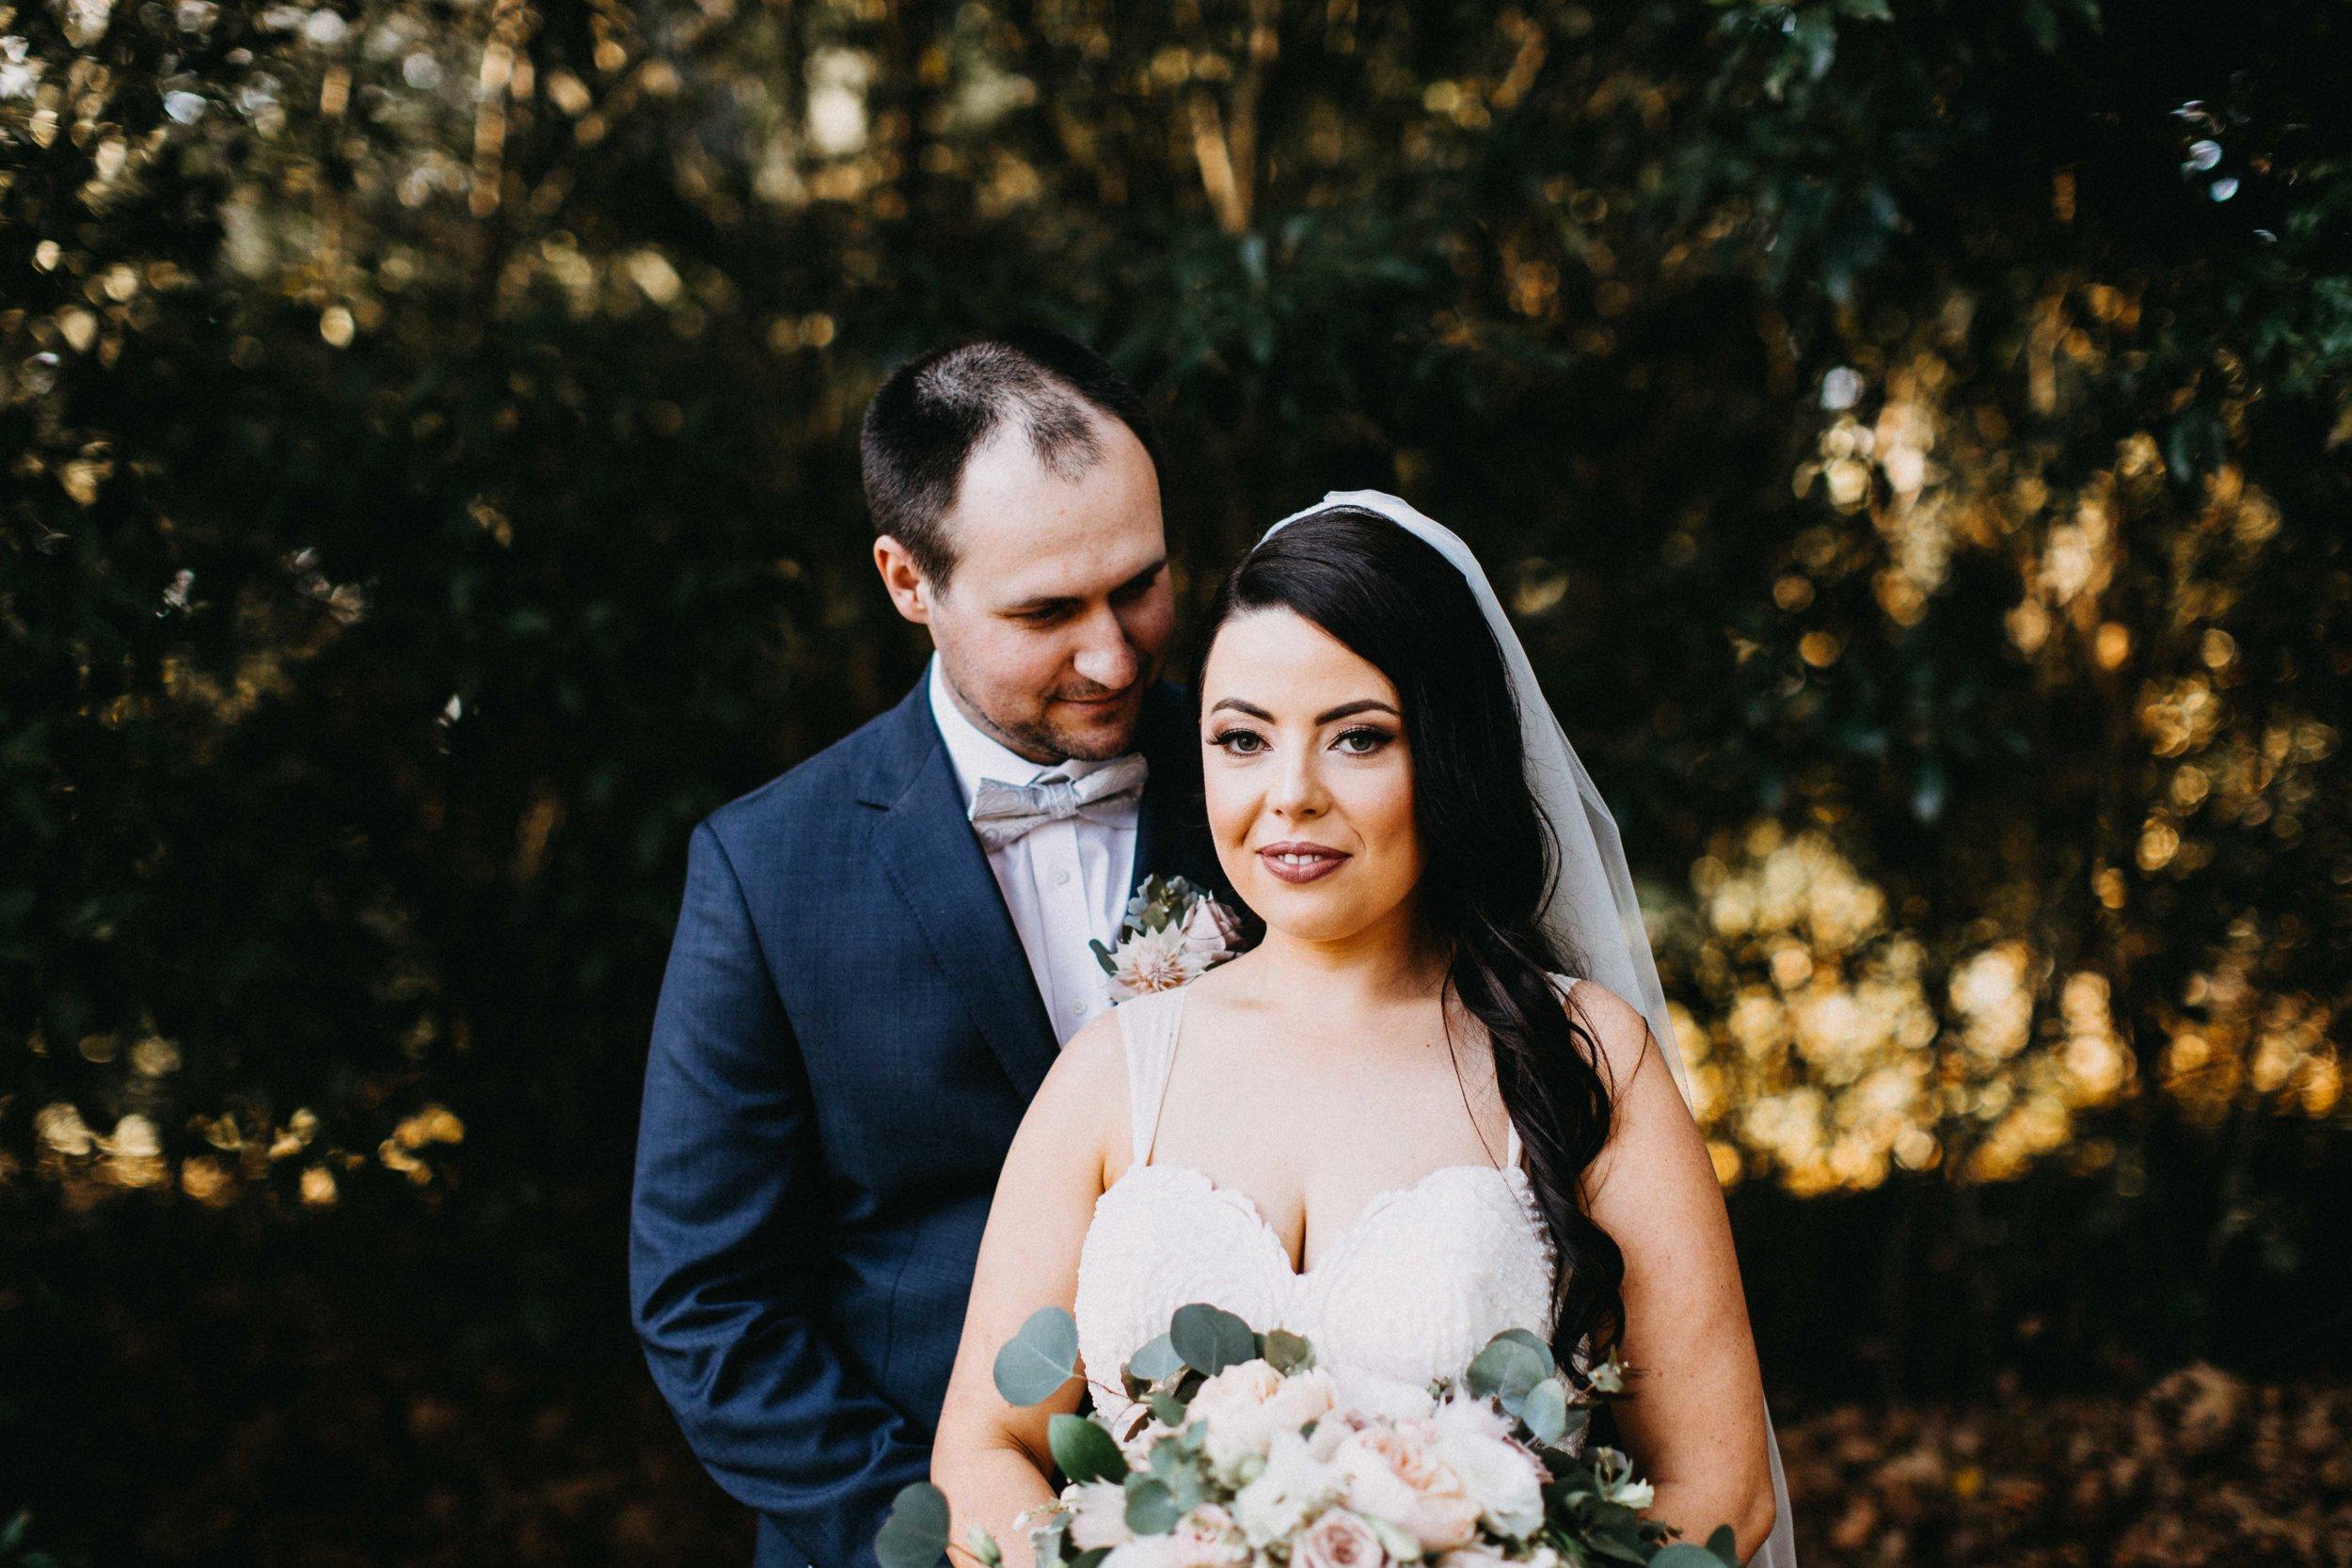 exeter-southern-highlands-wedding-www.emilyobrienphotography.net -105.jpg